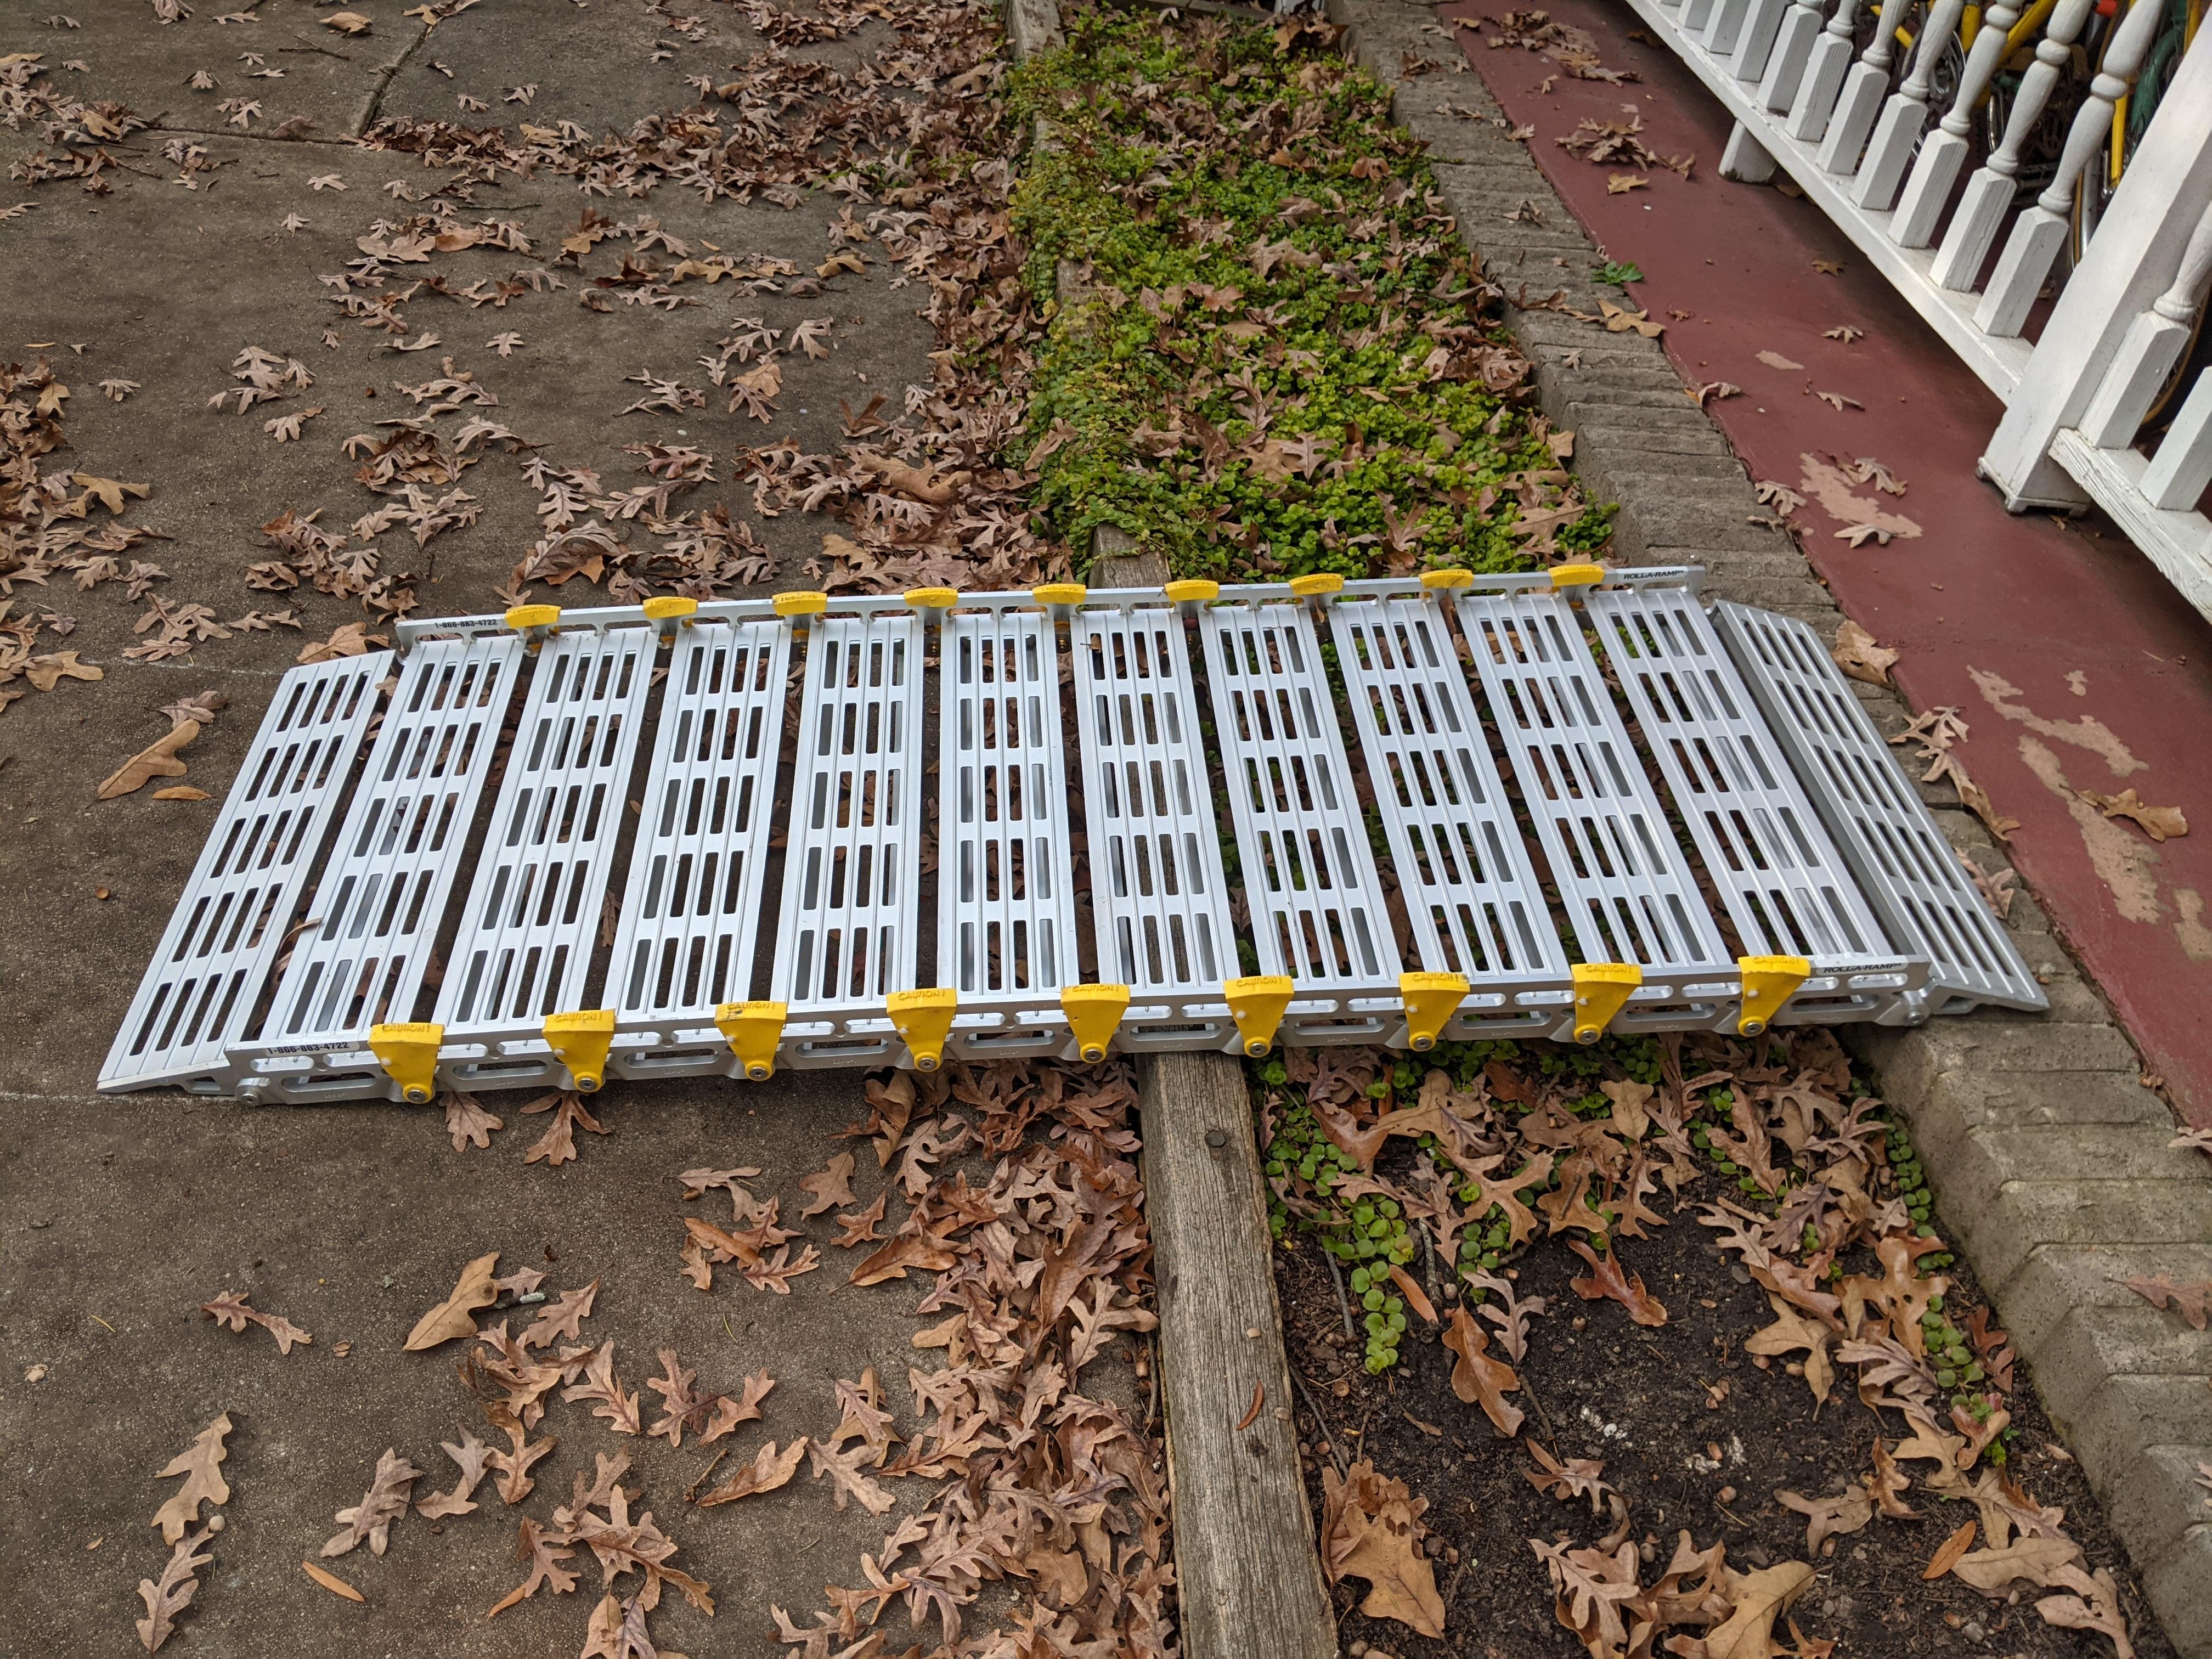 Photo 3 of portable ramp